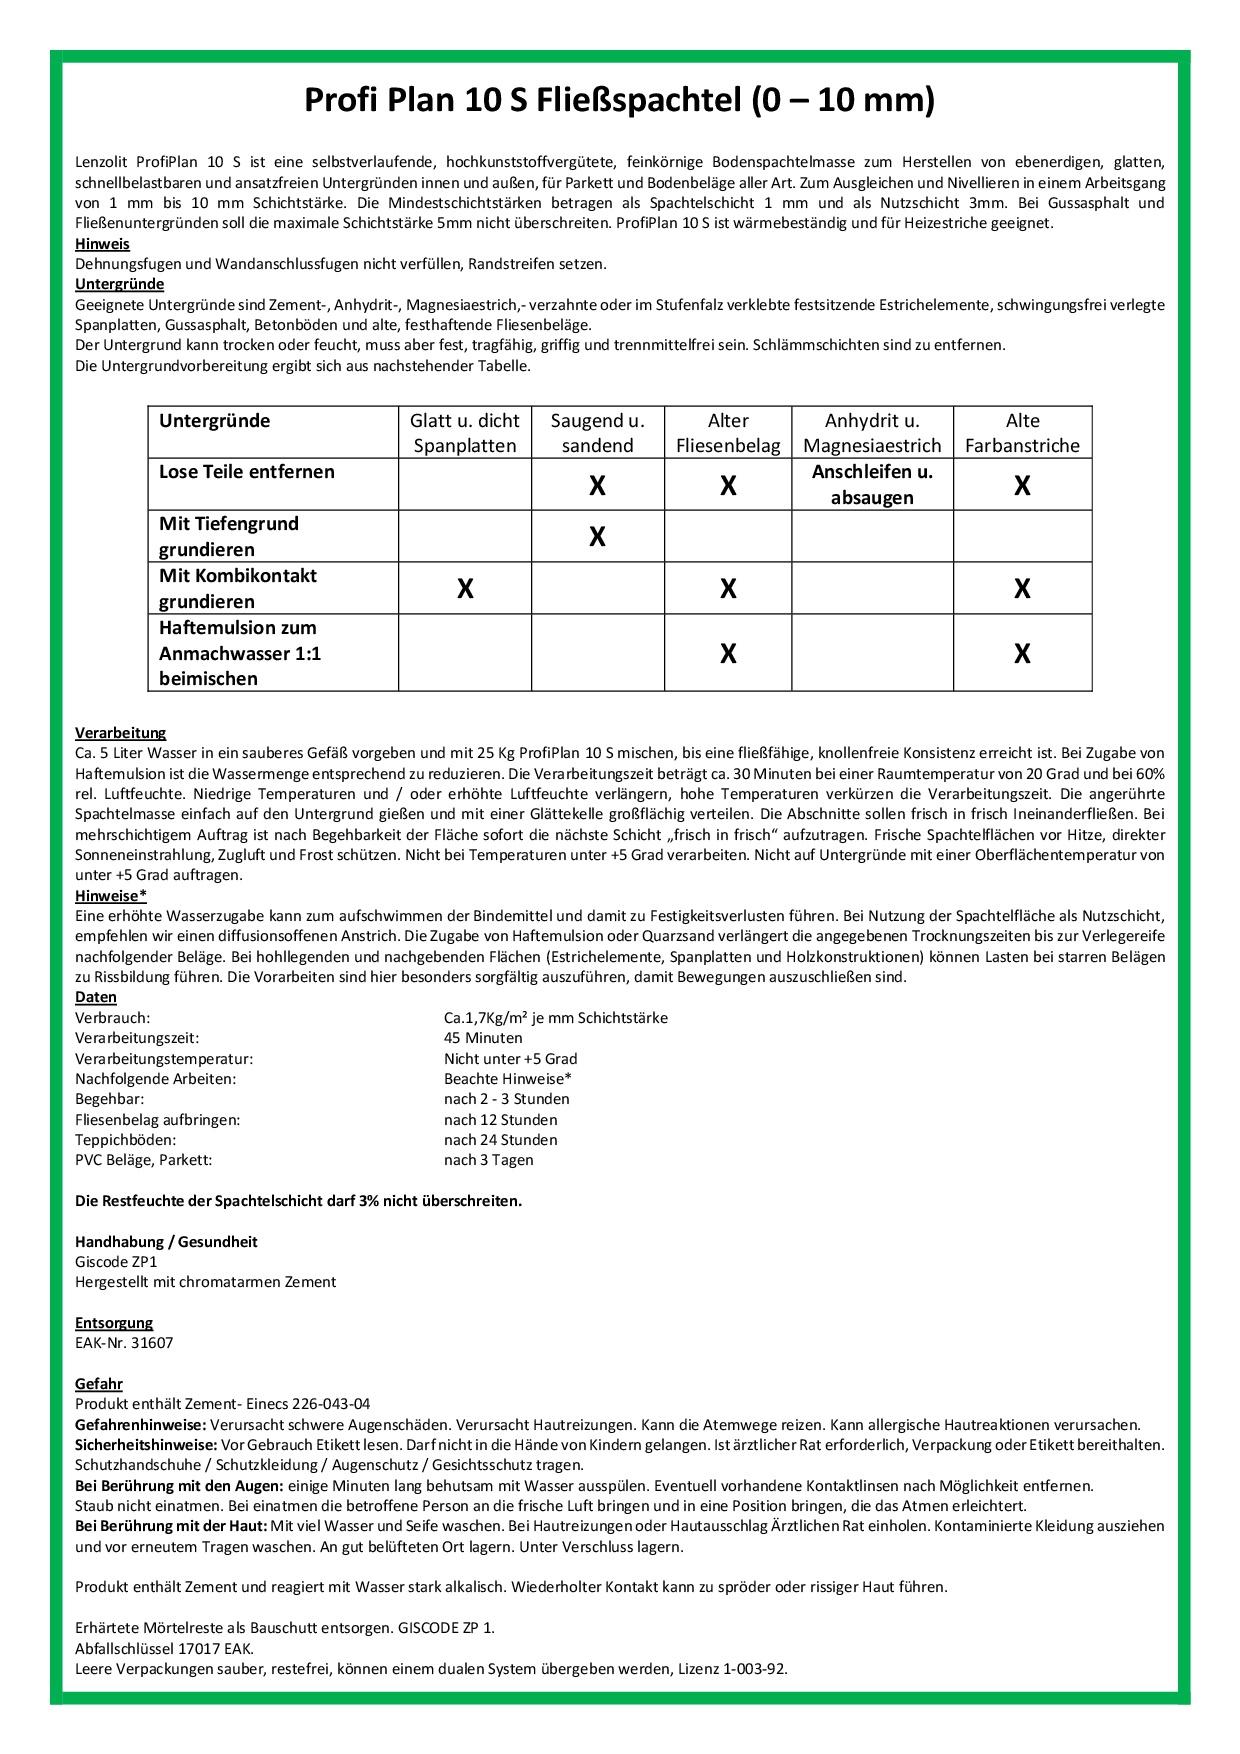 Datenblatt-Profiplan-10-S